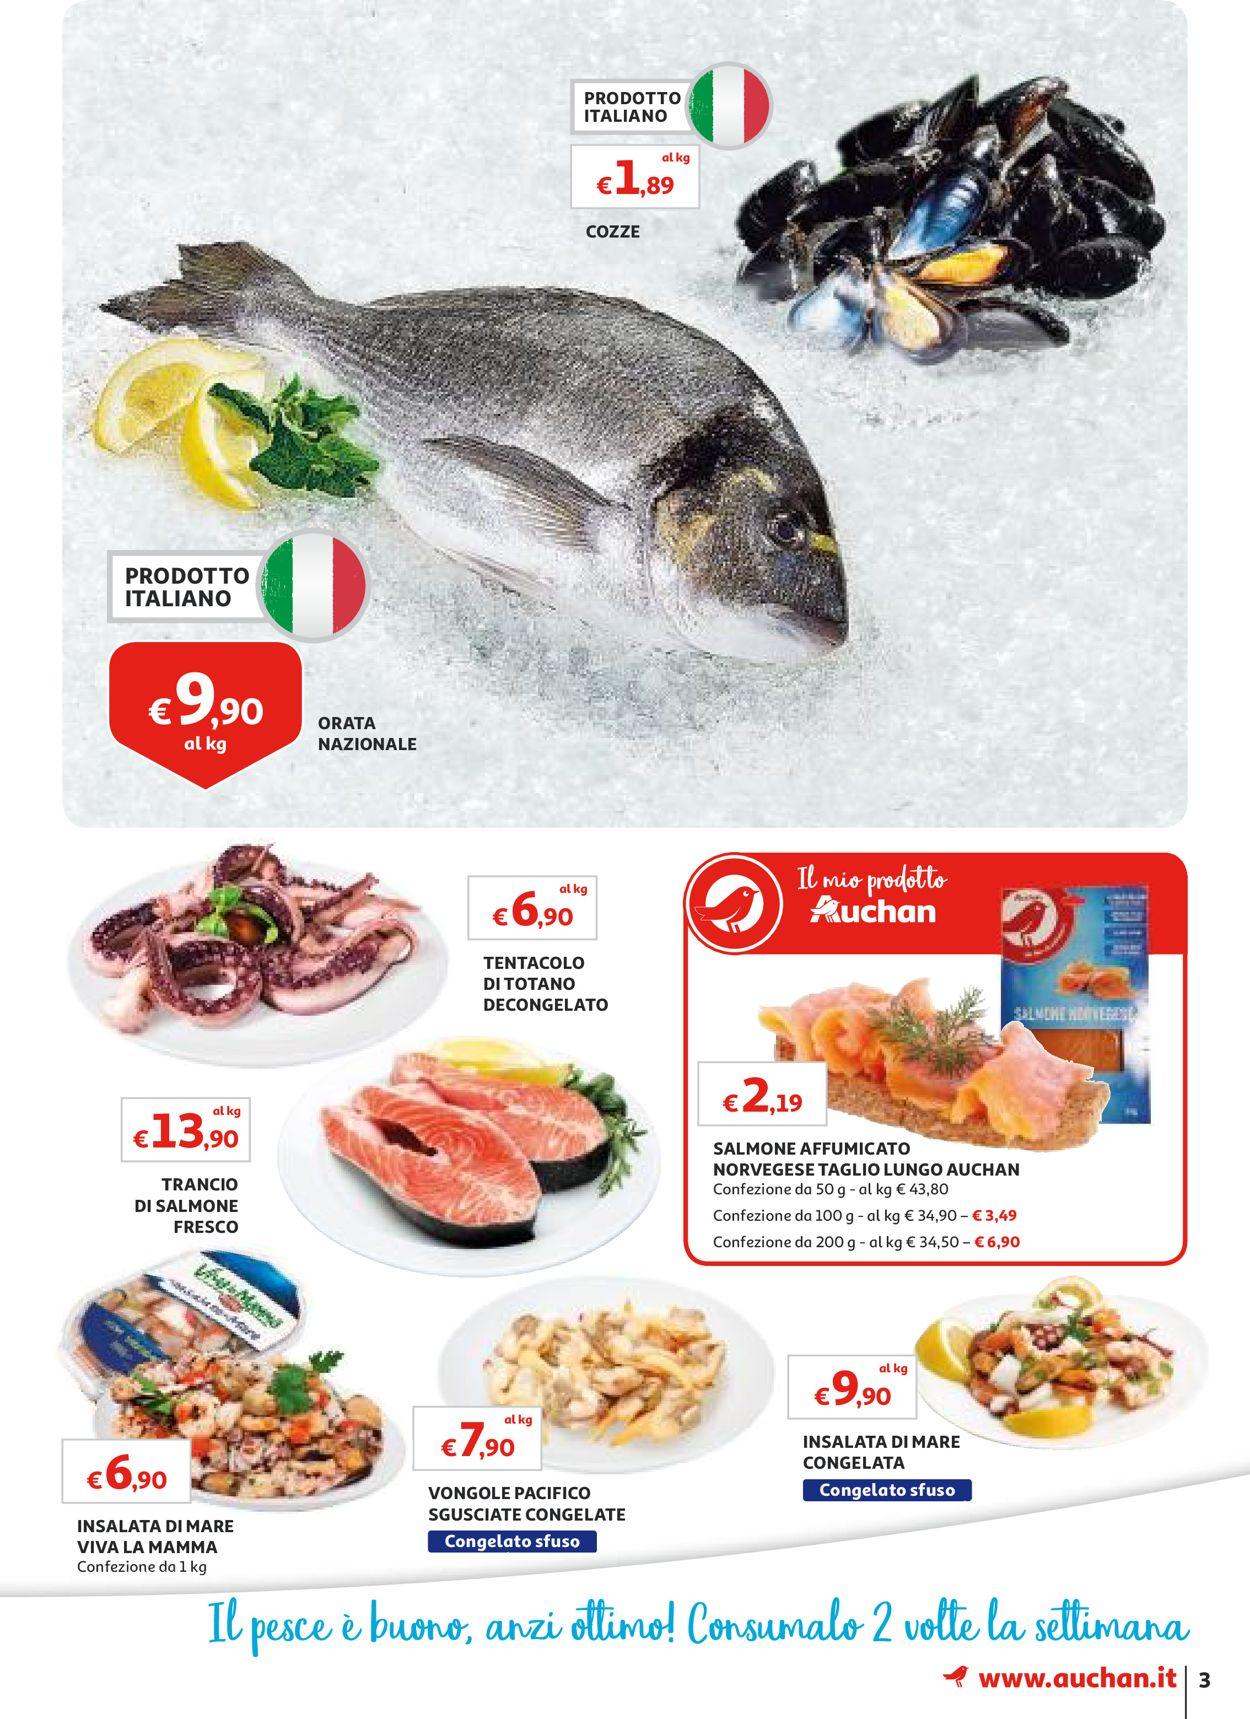 Volantino Auchan - Offerte 01/08-08/08/2019 (Pagina 3)